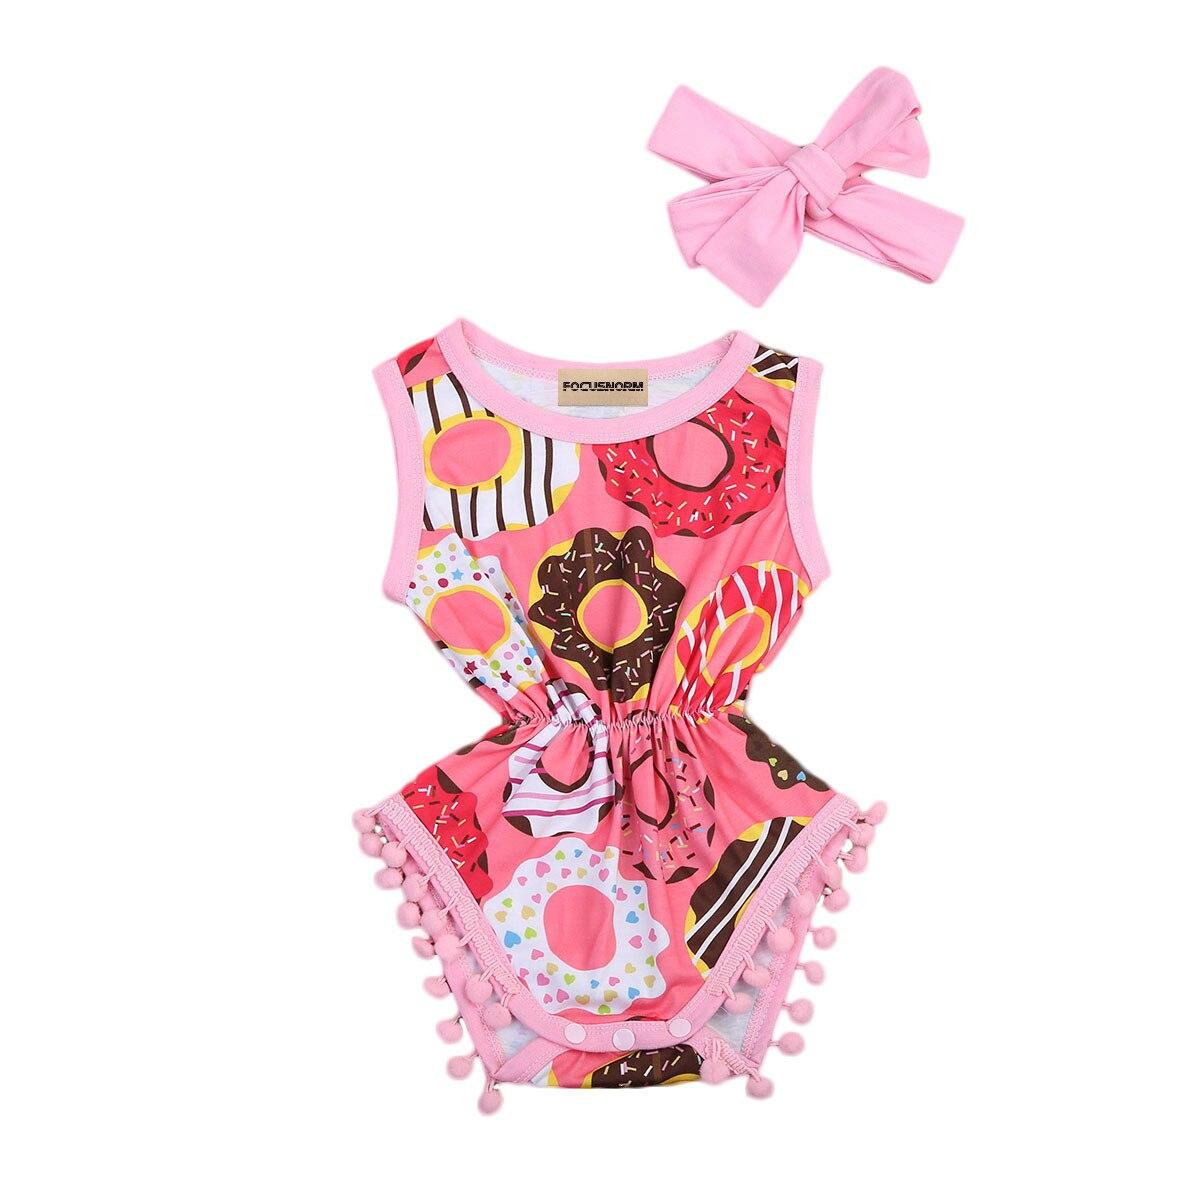 Toddler Baby Girls Newborn Tops Romper Sleeveless Jumpsuit Headband Outfit Set